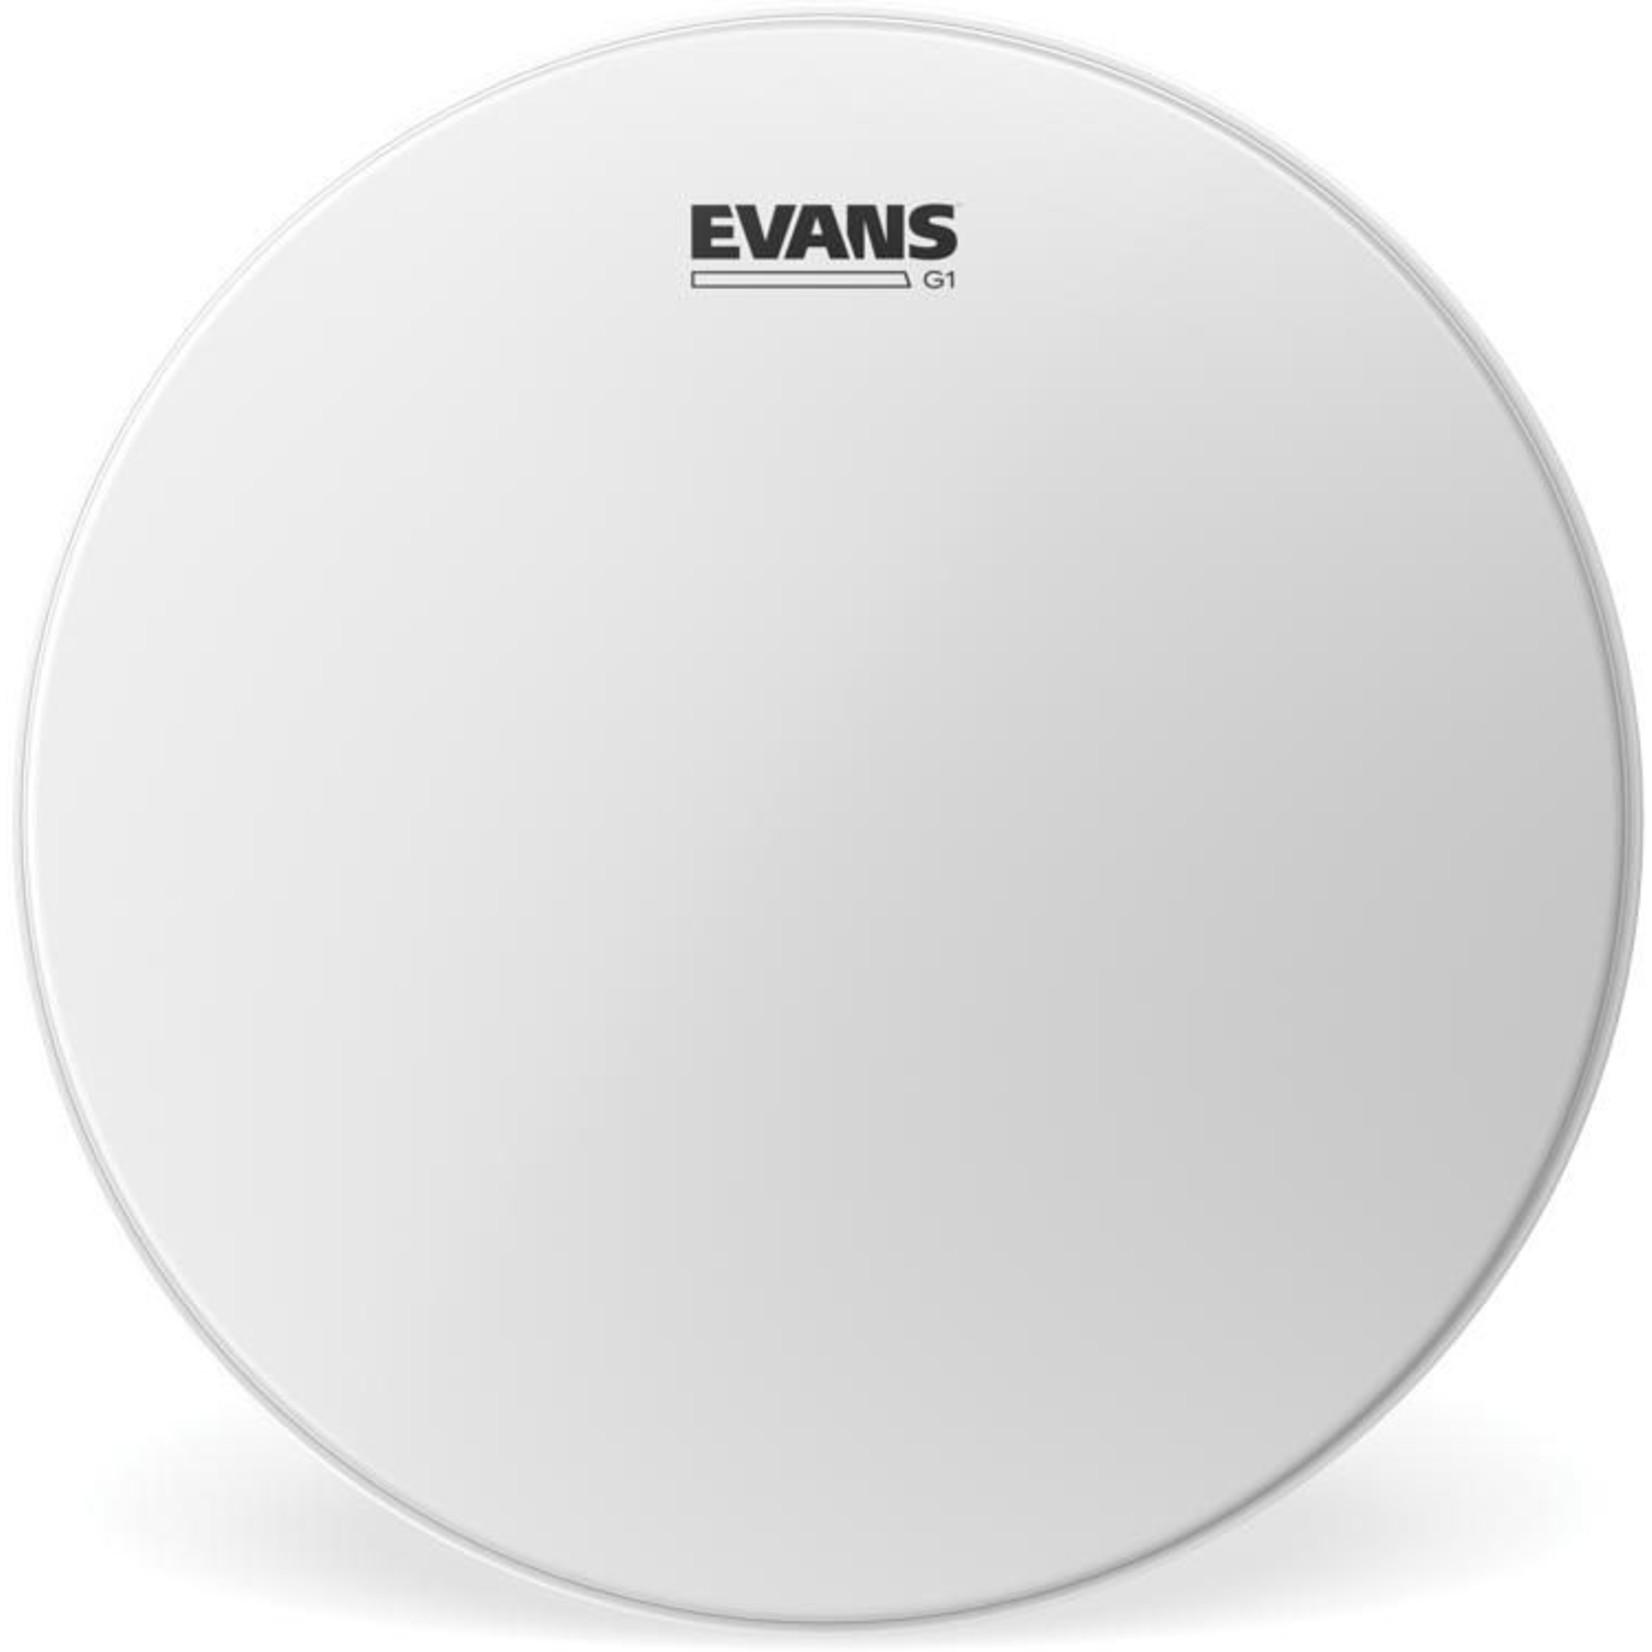 Evans Evans Coated G1 Bass Drum